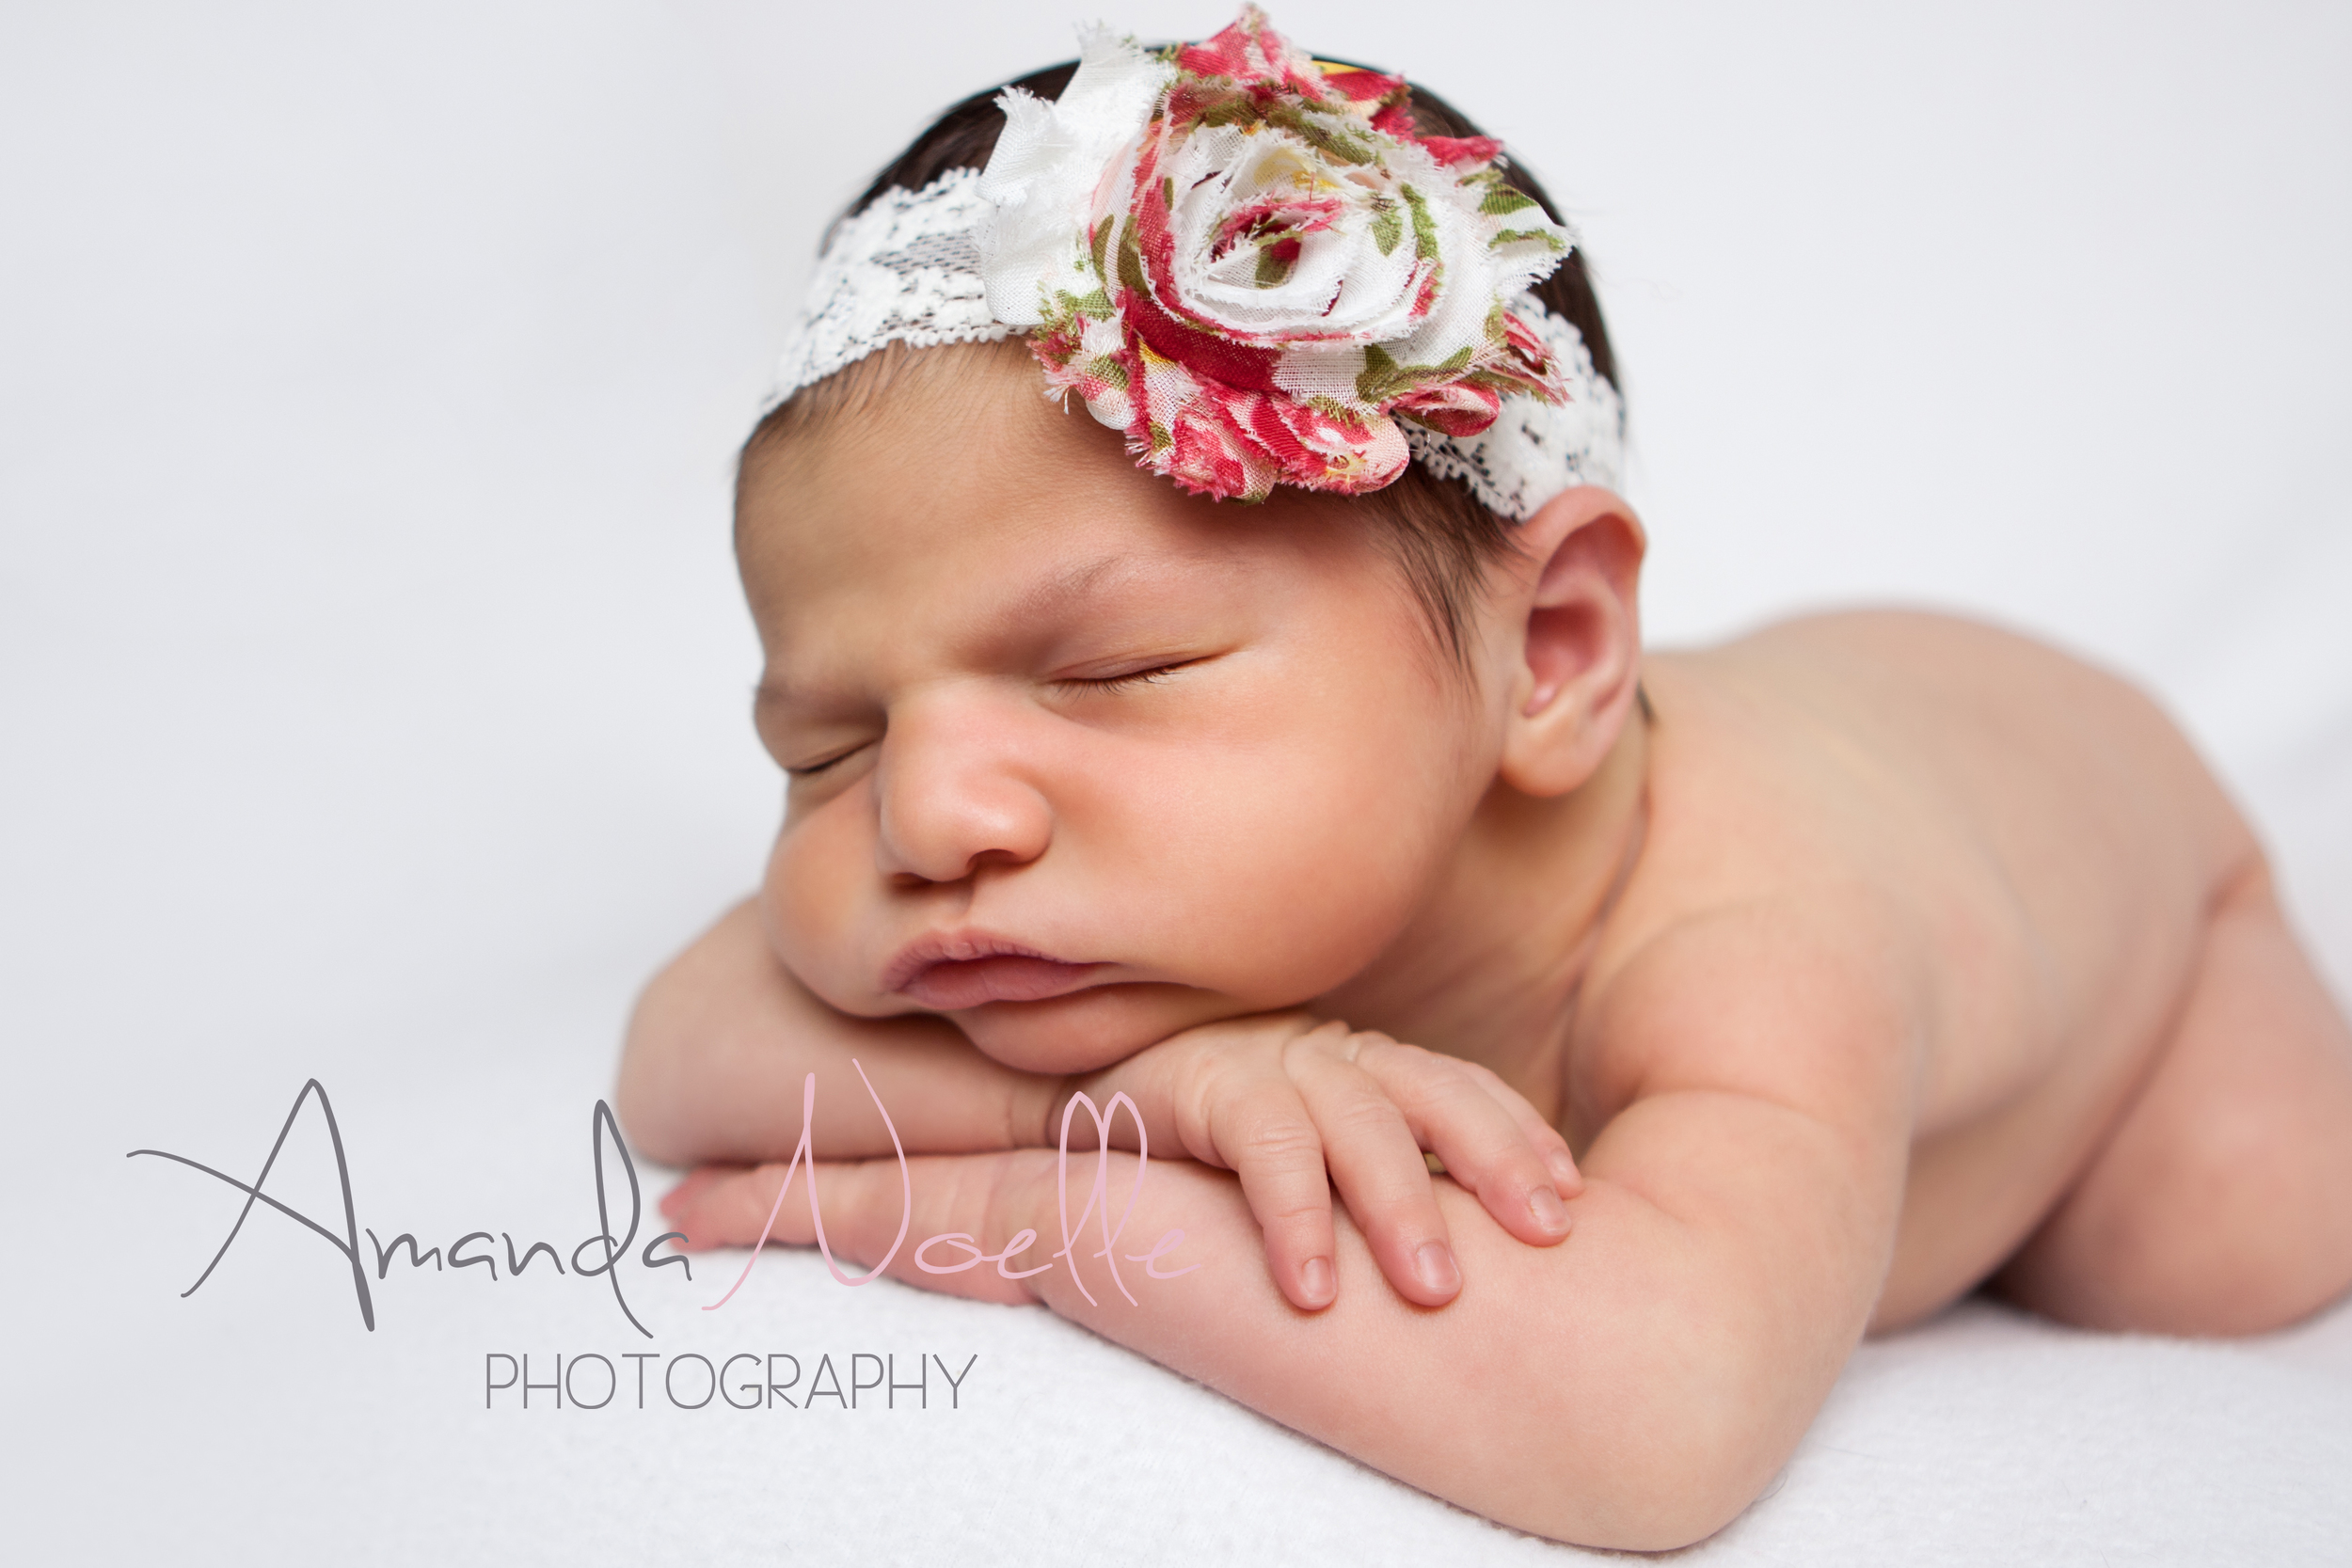 Newborn baby girl, white background fabric, white lace pink shabby chic flower headband, sleeping pose chin on hands on beanbag, by Westchester, New York Newborn Photographer, Amanda Noelle Photography